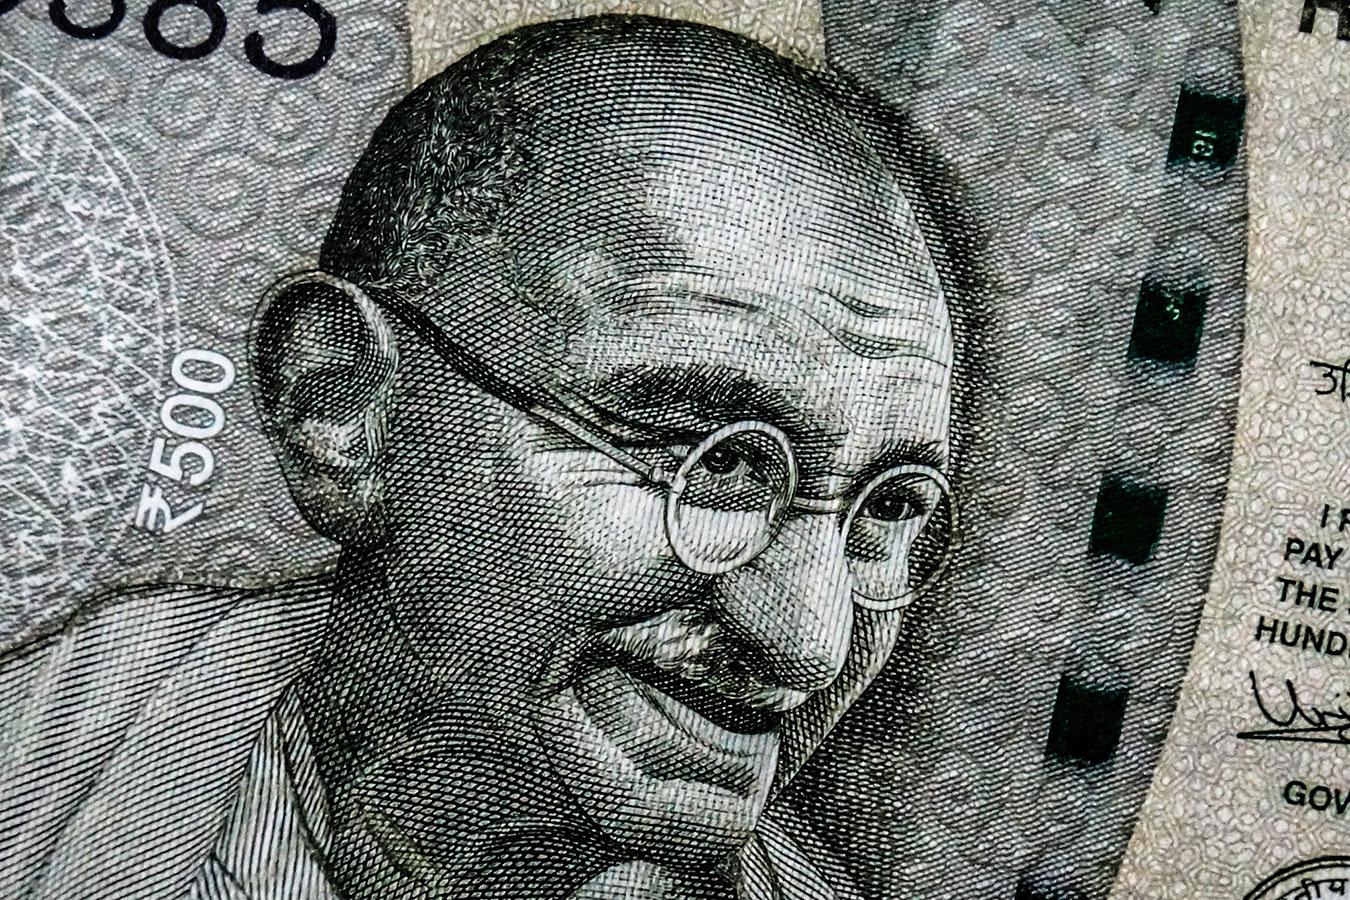 ind-independence-day-2018-mahatma-gandhi-rupee.jpg